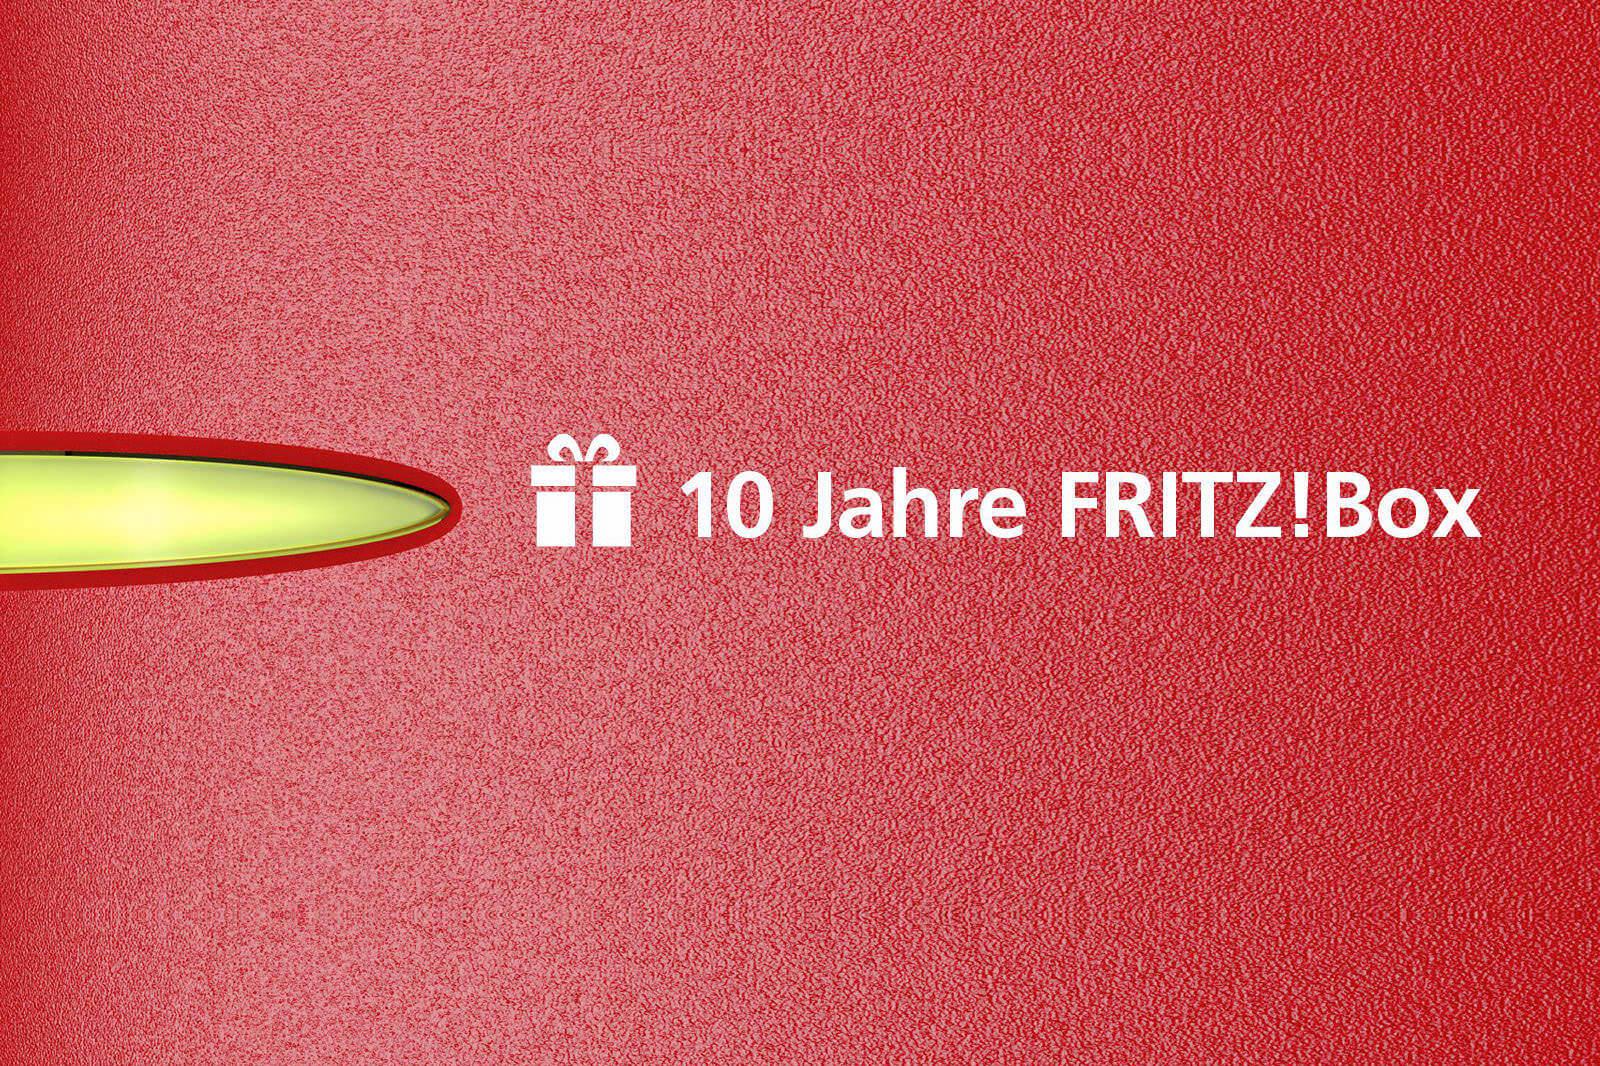 10 Jahre FRITZ!Box